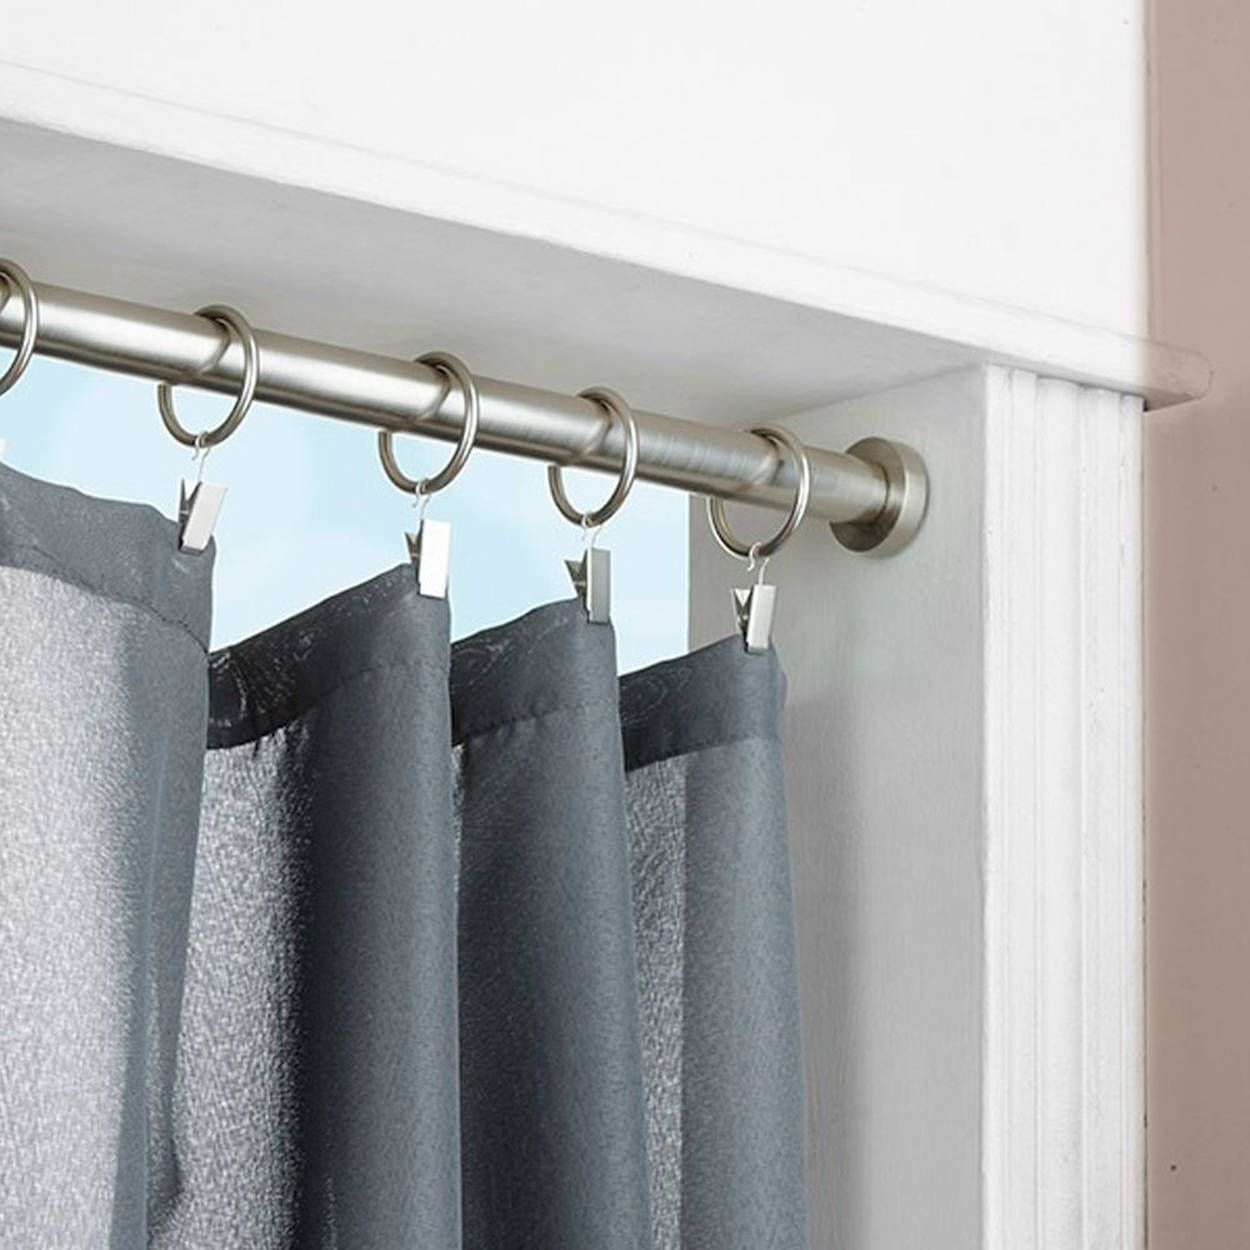 Curtain Tension Rod Diameter 16 19 Mm Tension Rod Curtains Curtains Curtain Rods Tension curtain rod extra long